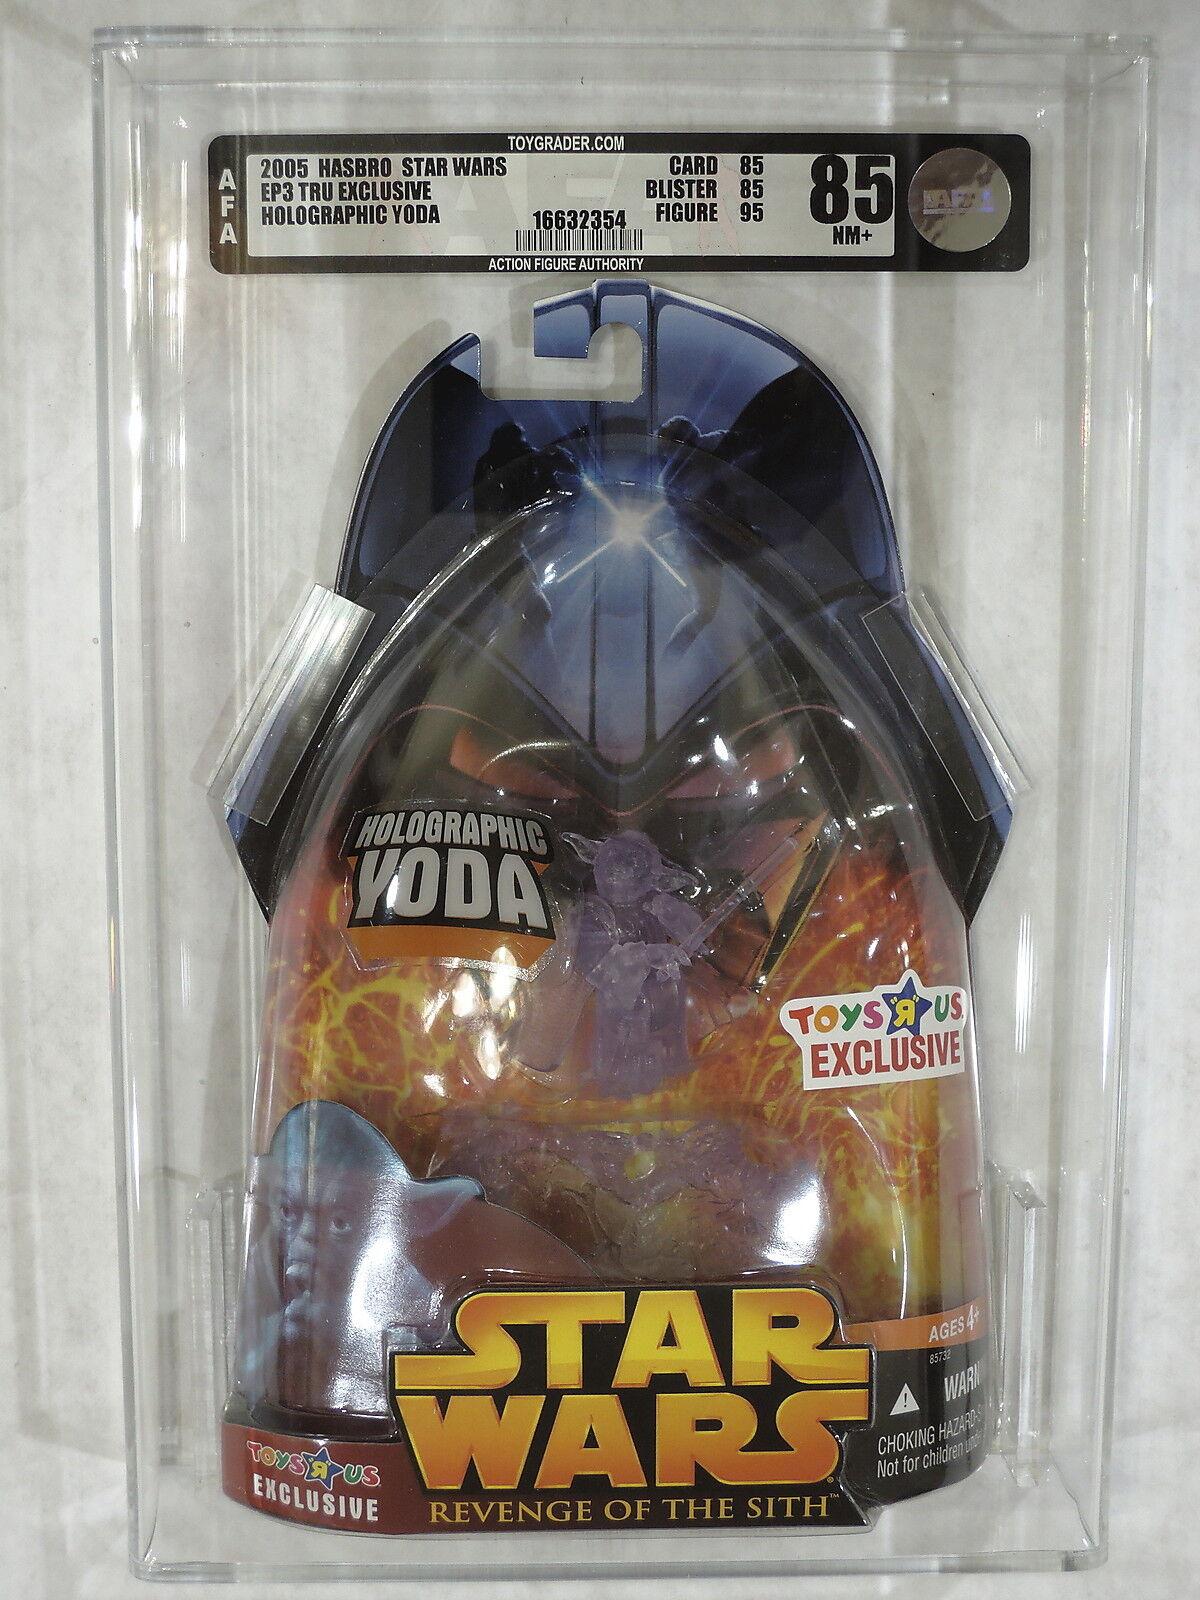 2005 Star Wars ROTS TRU Exclusive Jedi Master HOLOGRAPHIC YODA Figure  AFA 85